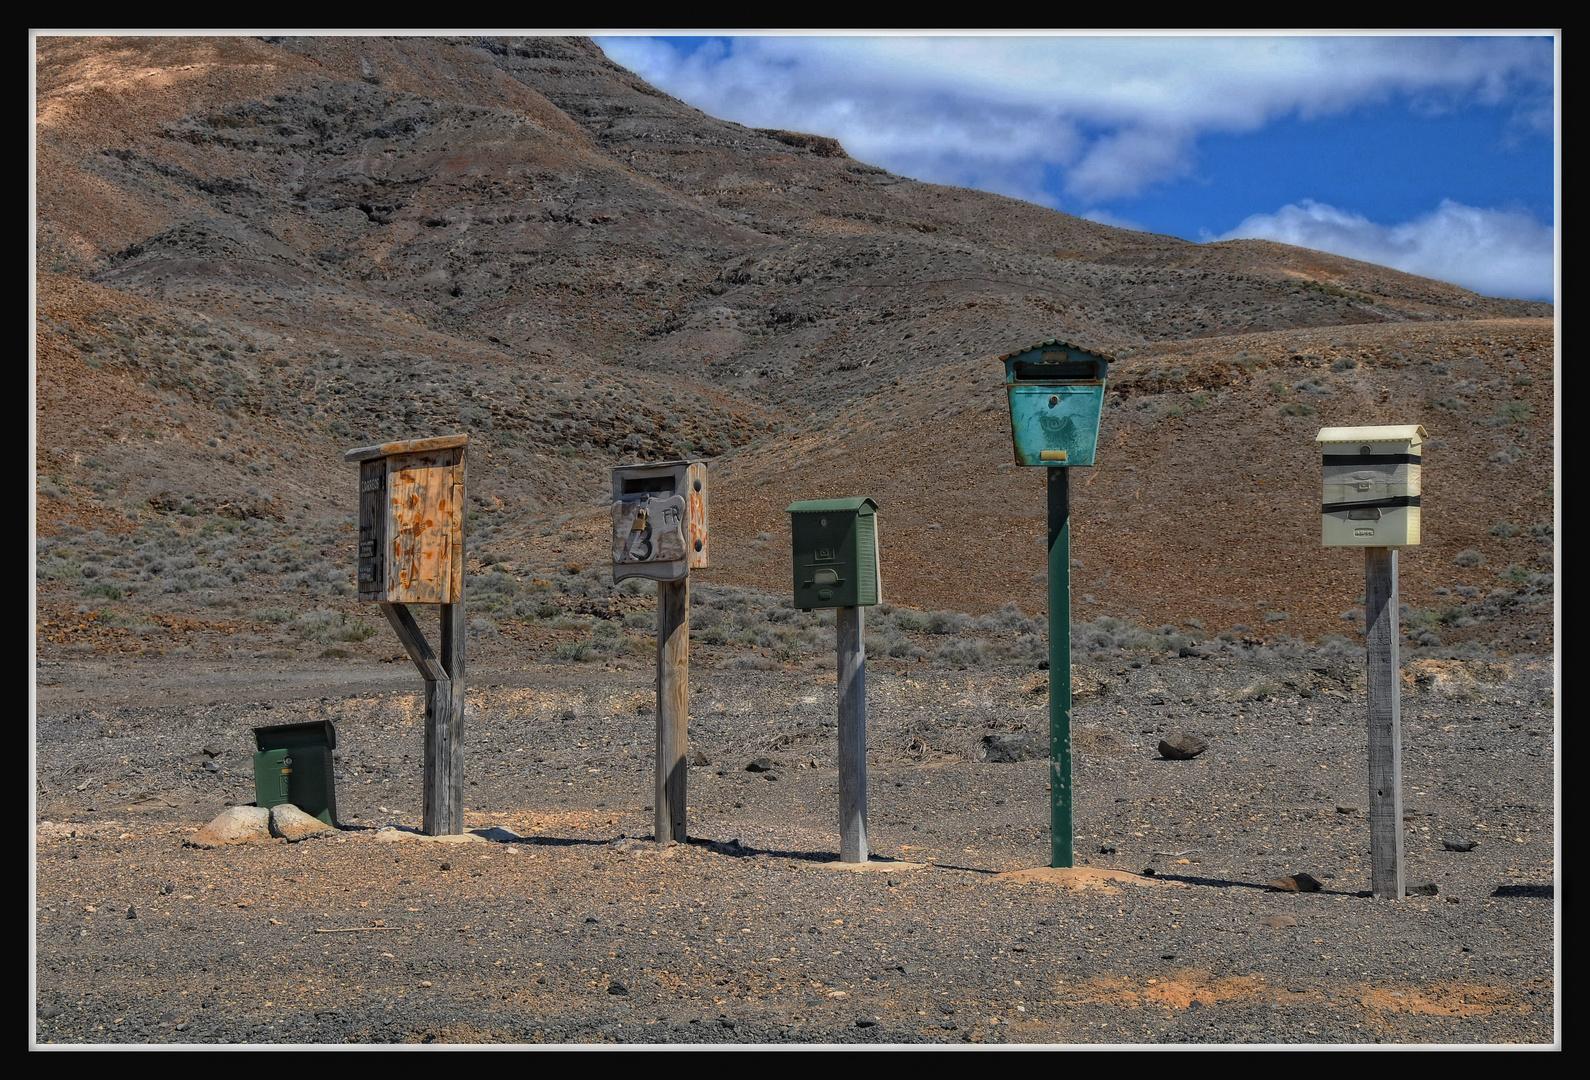 Fuerteventura - Please, Mr Postman ...